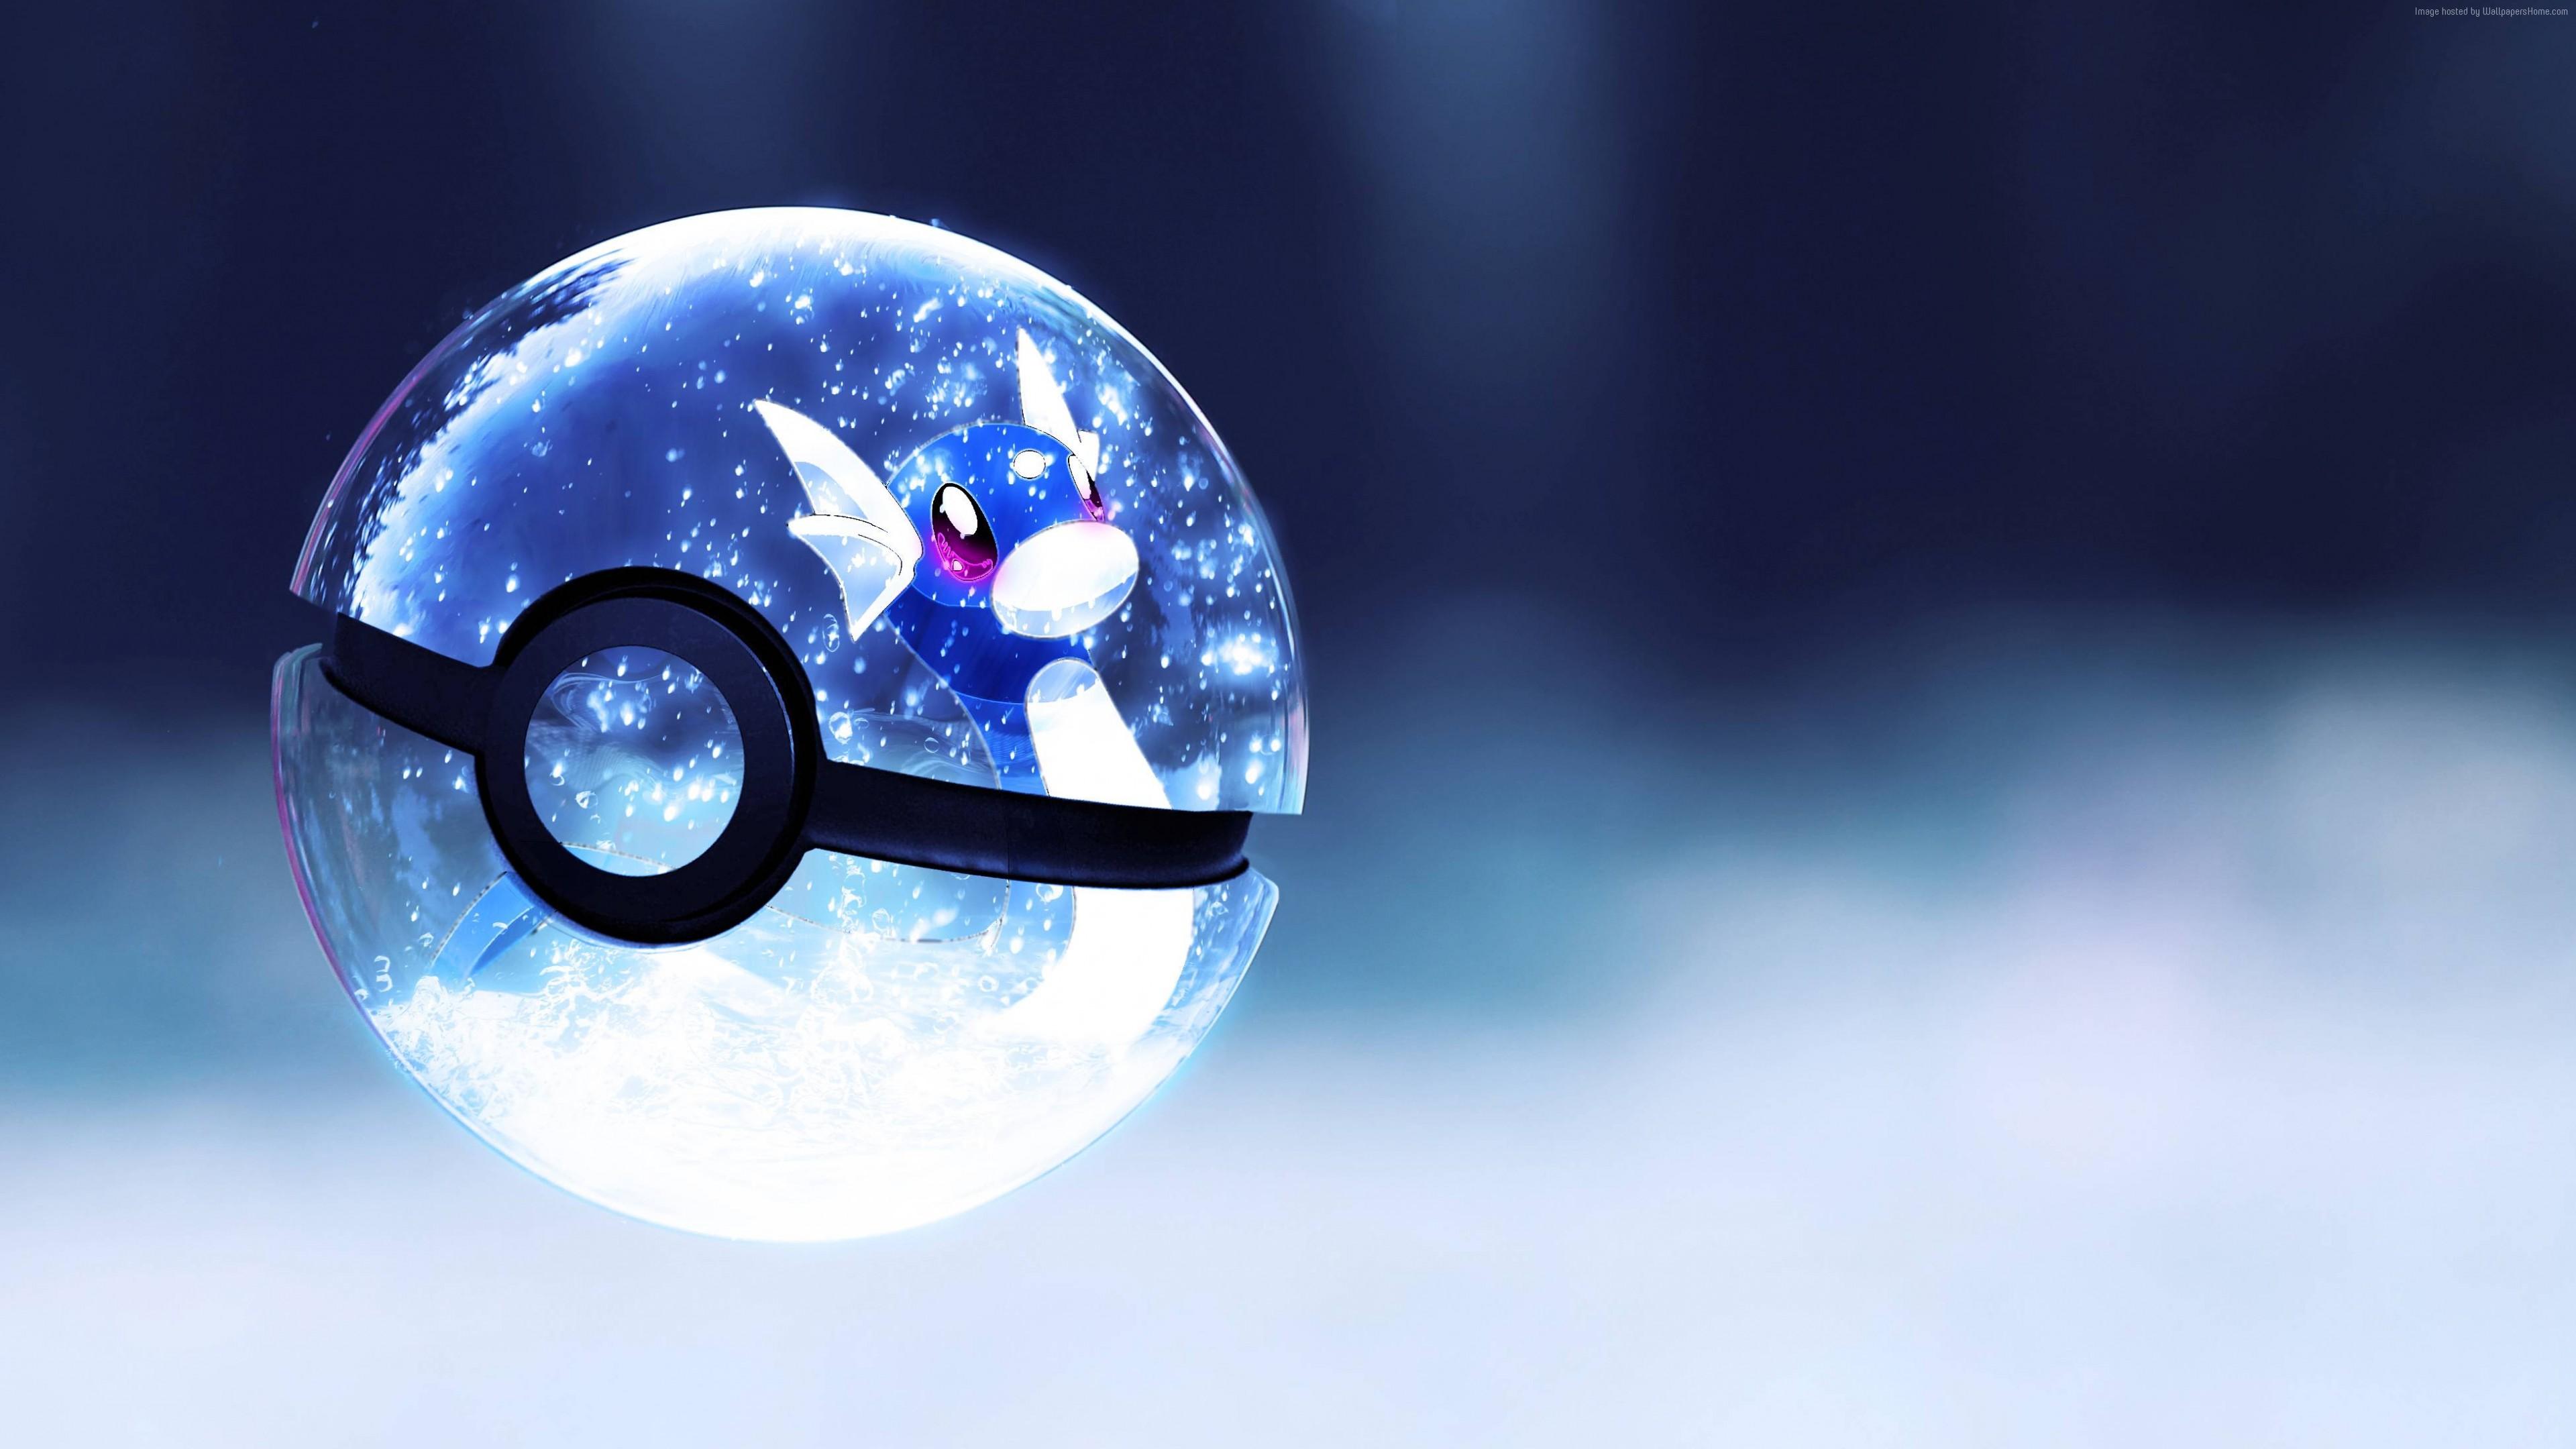 Pokemon Go Nokia 230 215 Samsung Xcover 550 LG G350 Android